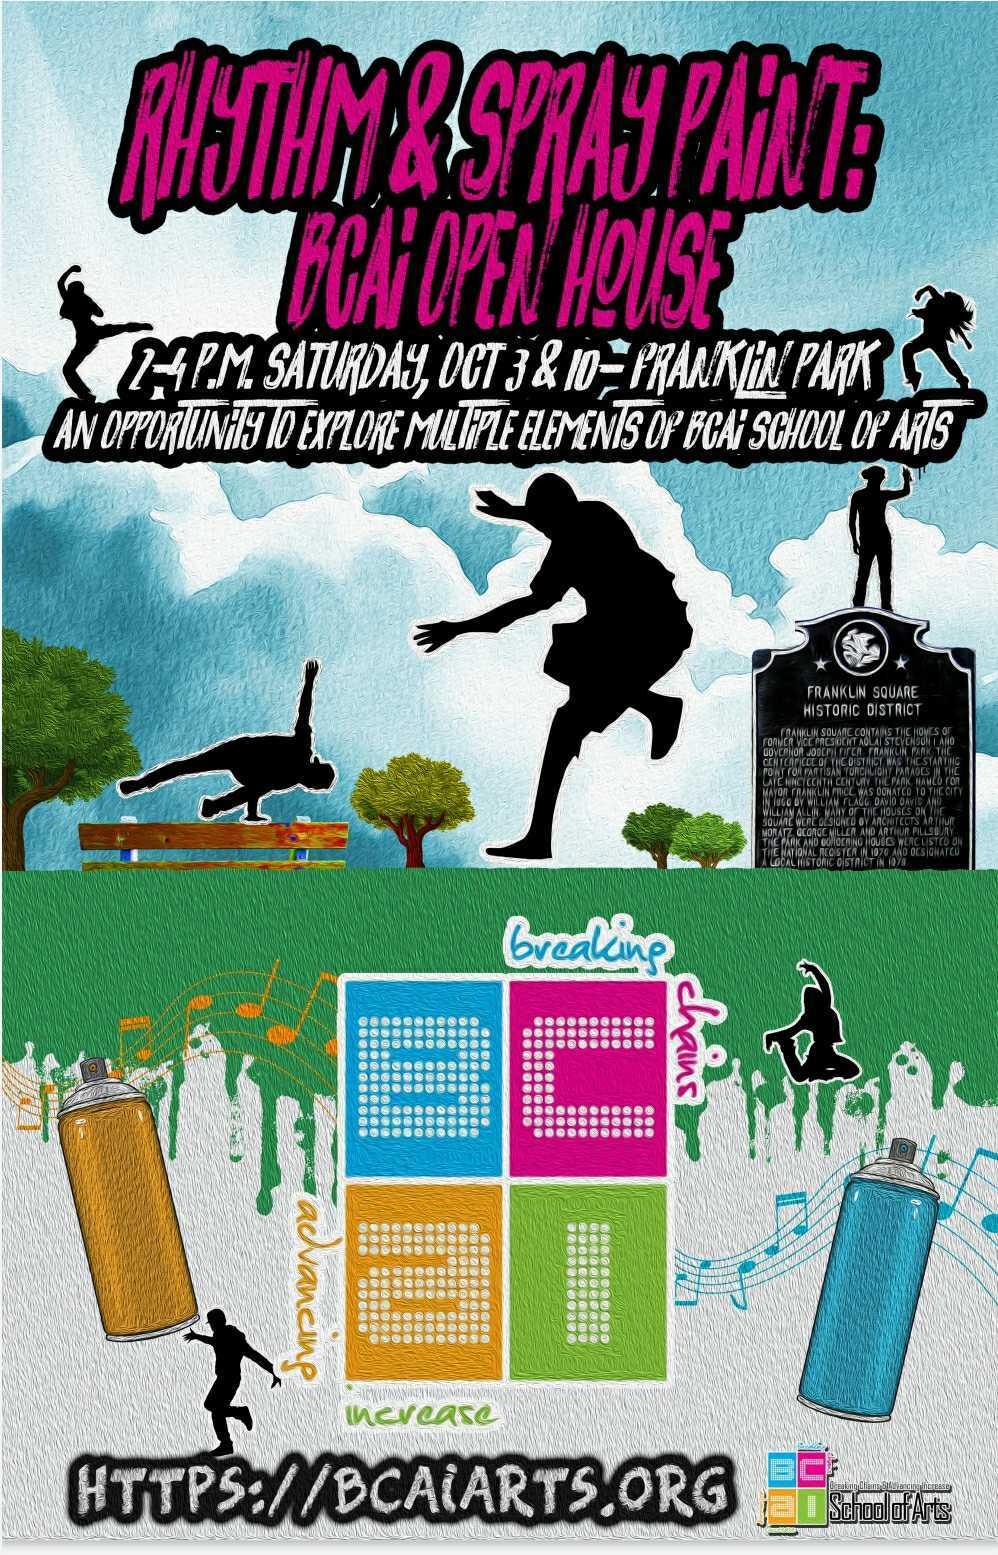 flyer for rhythm & spraypaint open house event